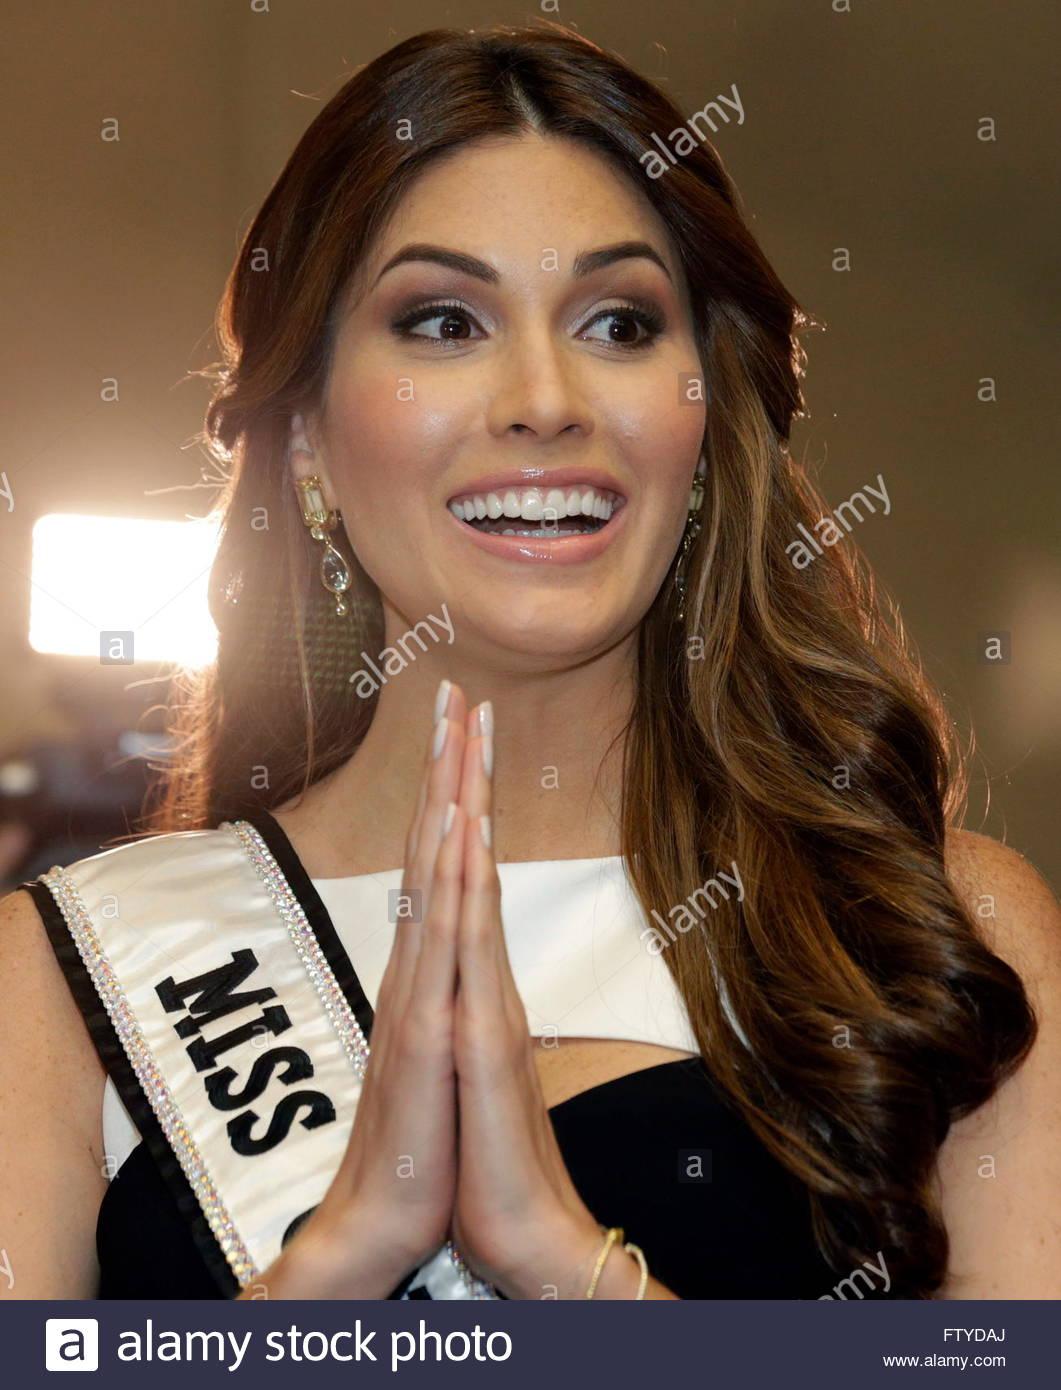 gabriela isler, miss universe 2013. - Página 22 Miss-universe-2013-gabriela-isler-of-venezuela-gestures-during-a-press-ftydaj_tjr2